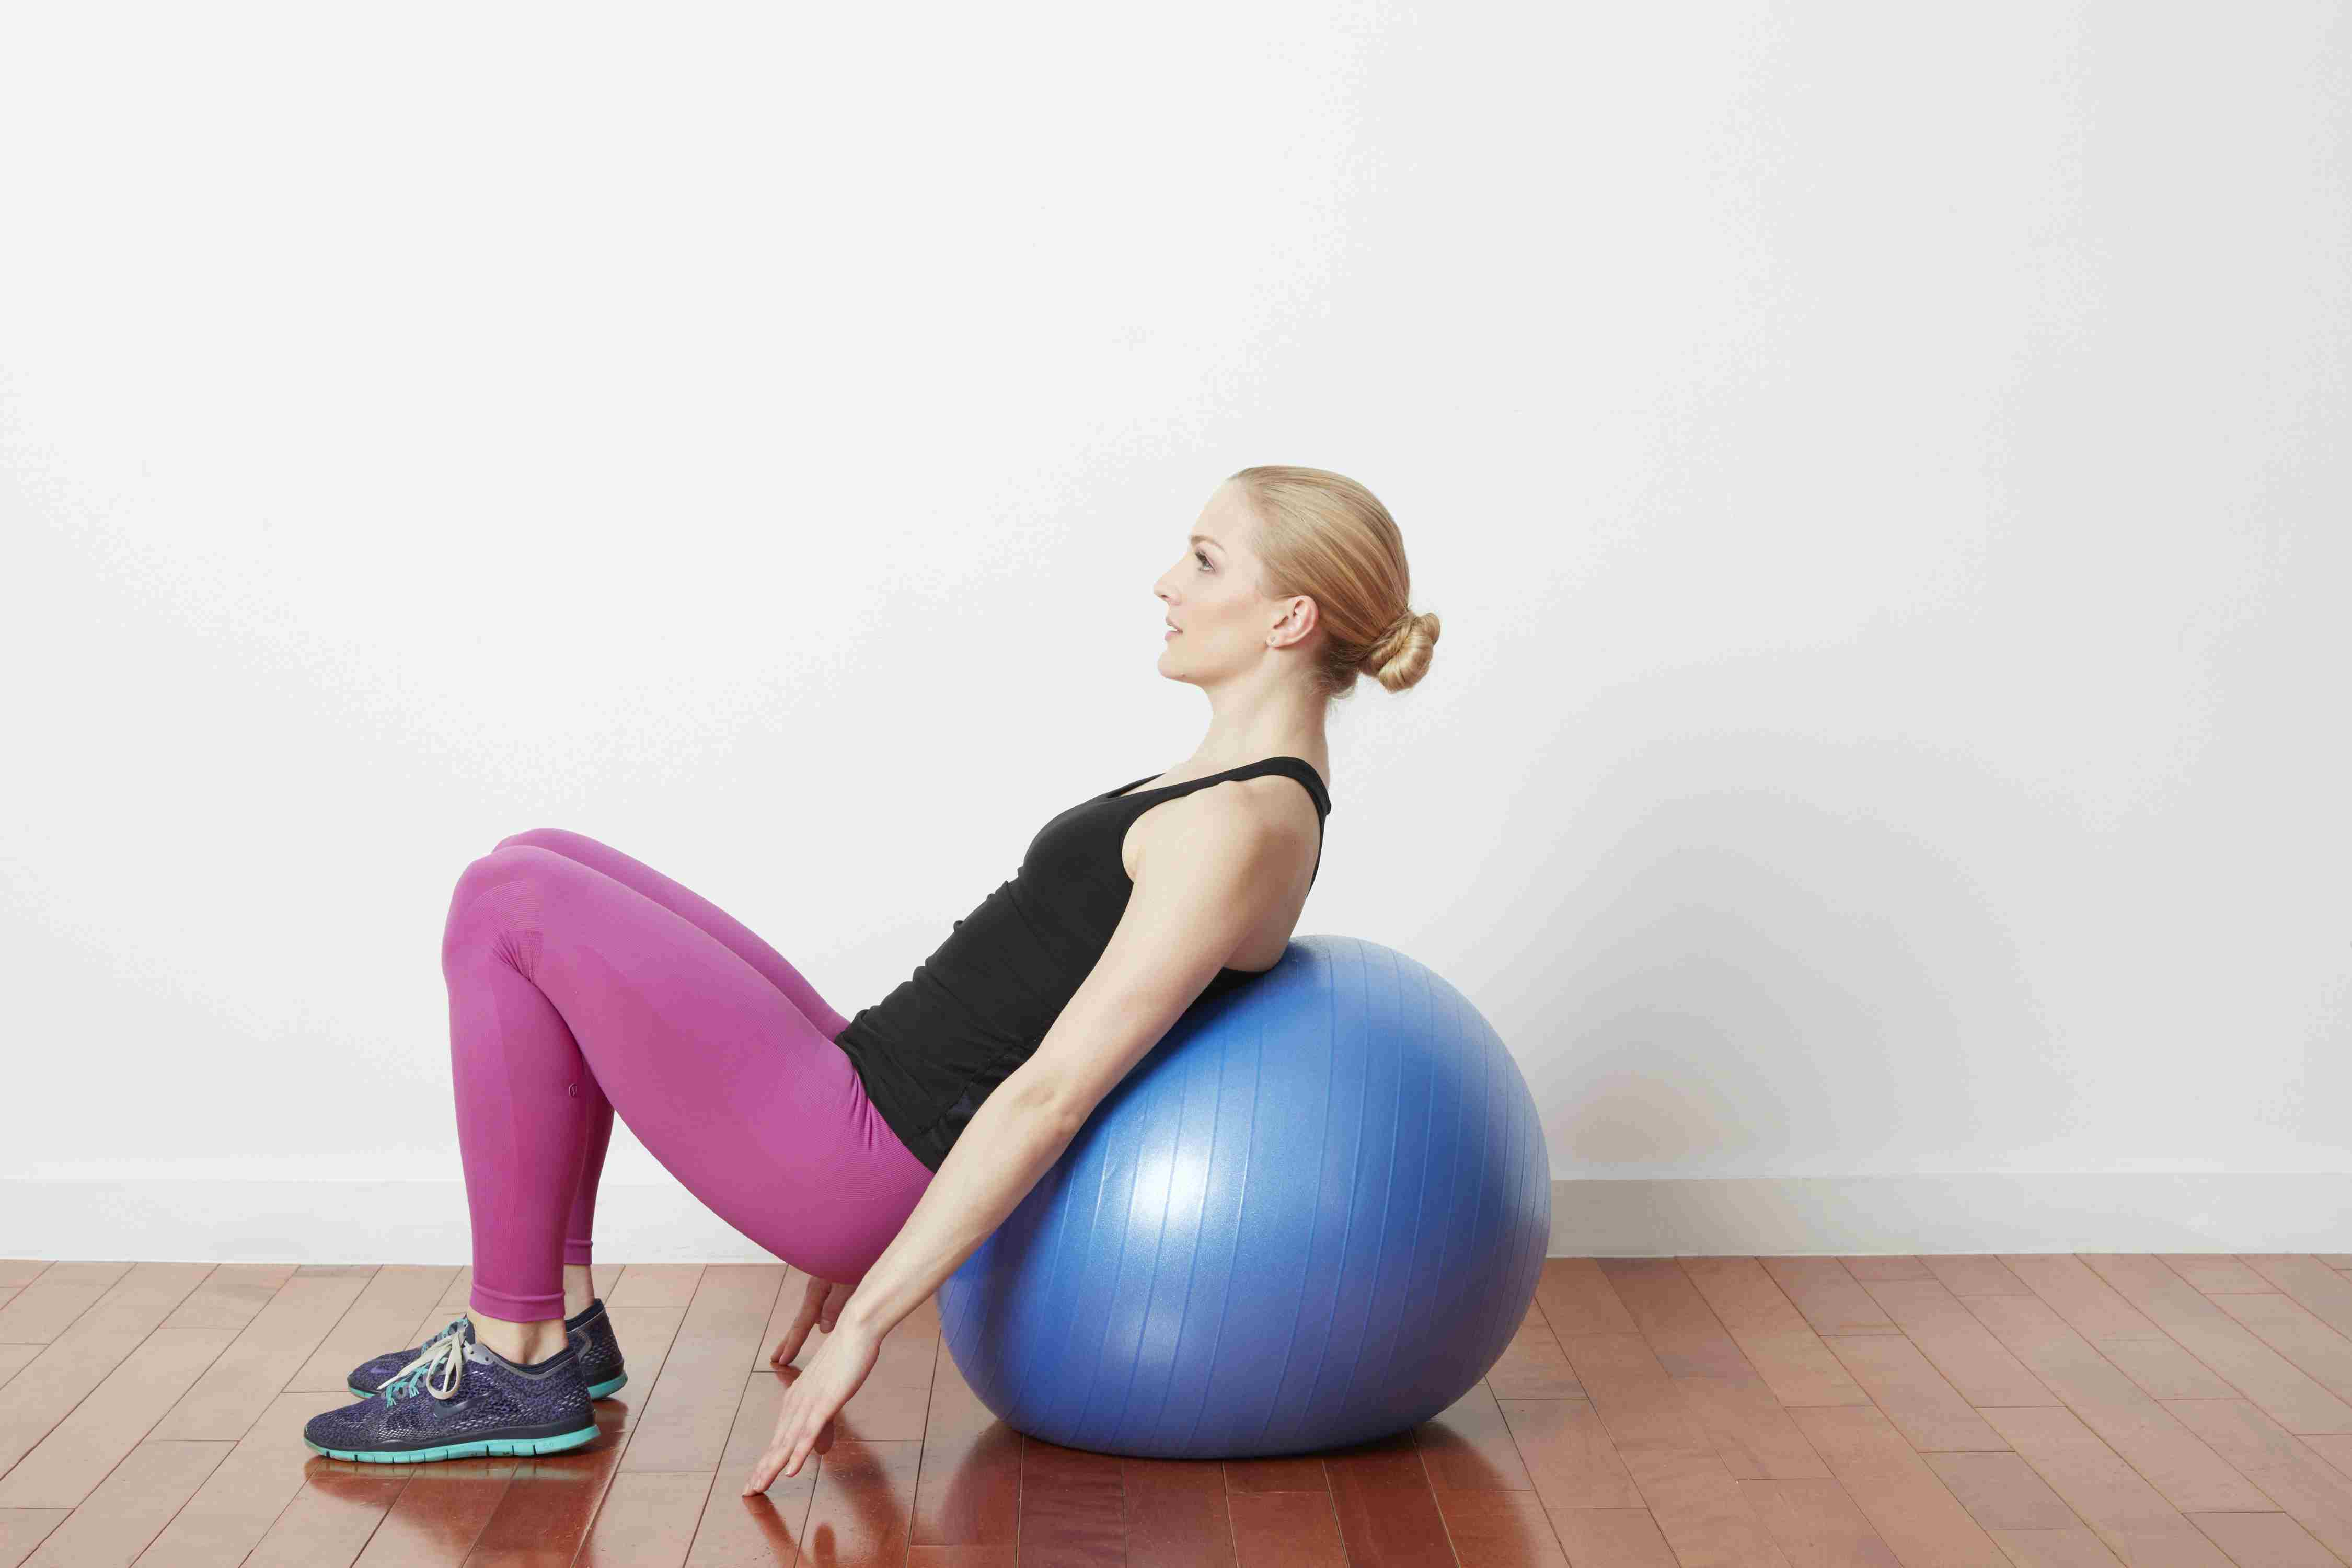 Leg press with ball